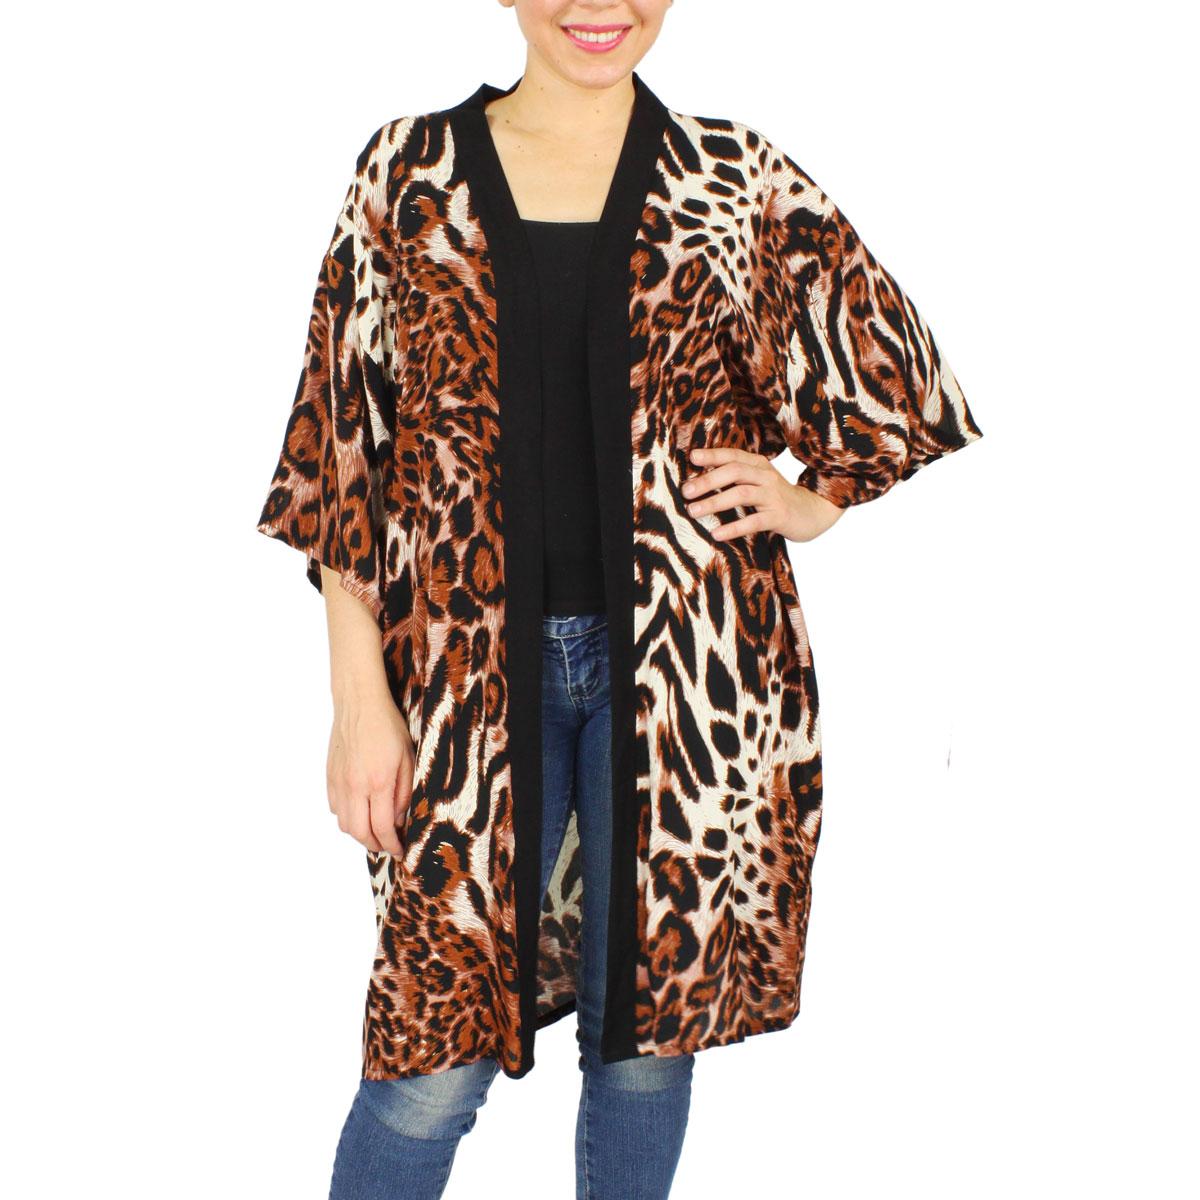 Kimono - Leopard Print 9360